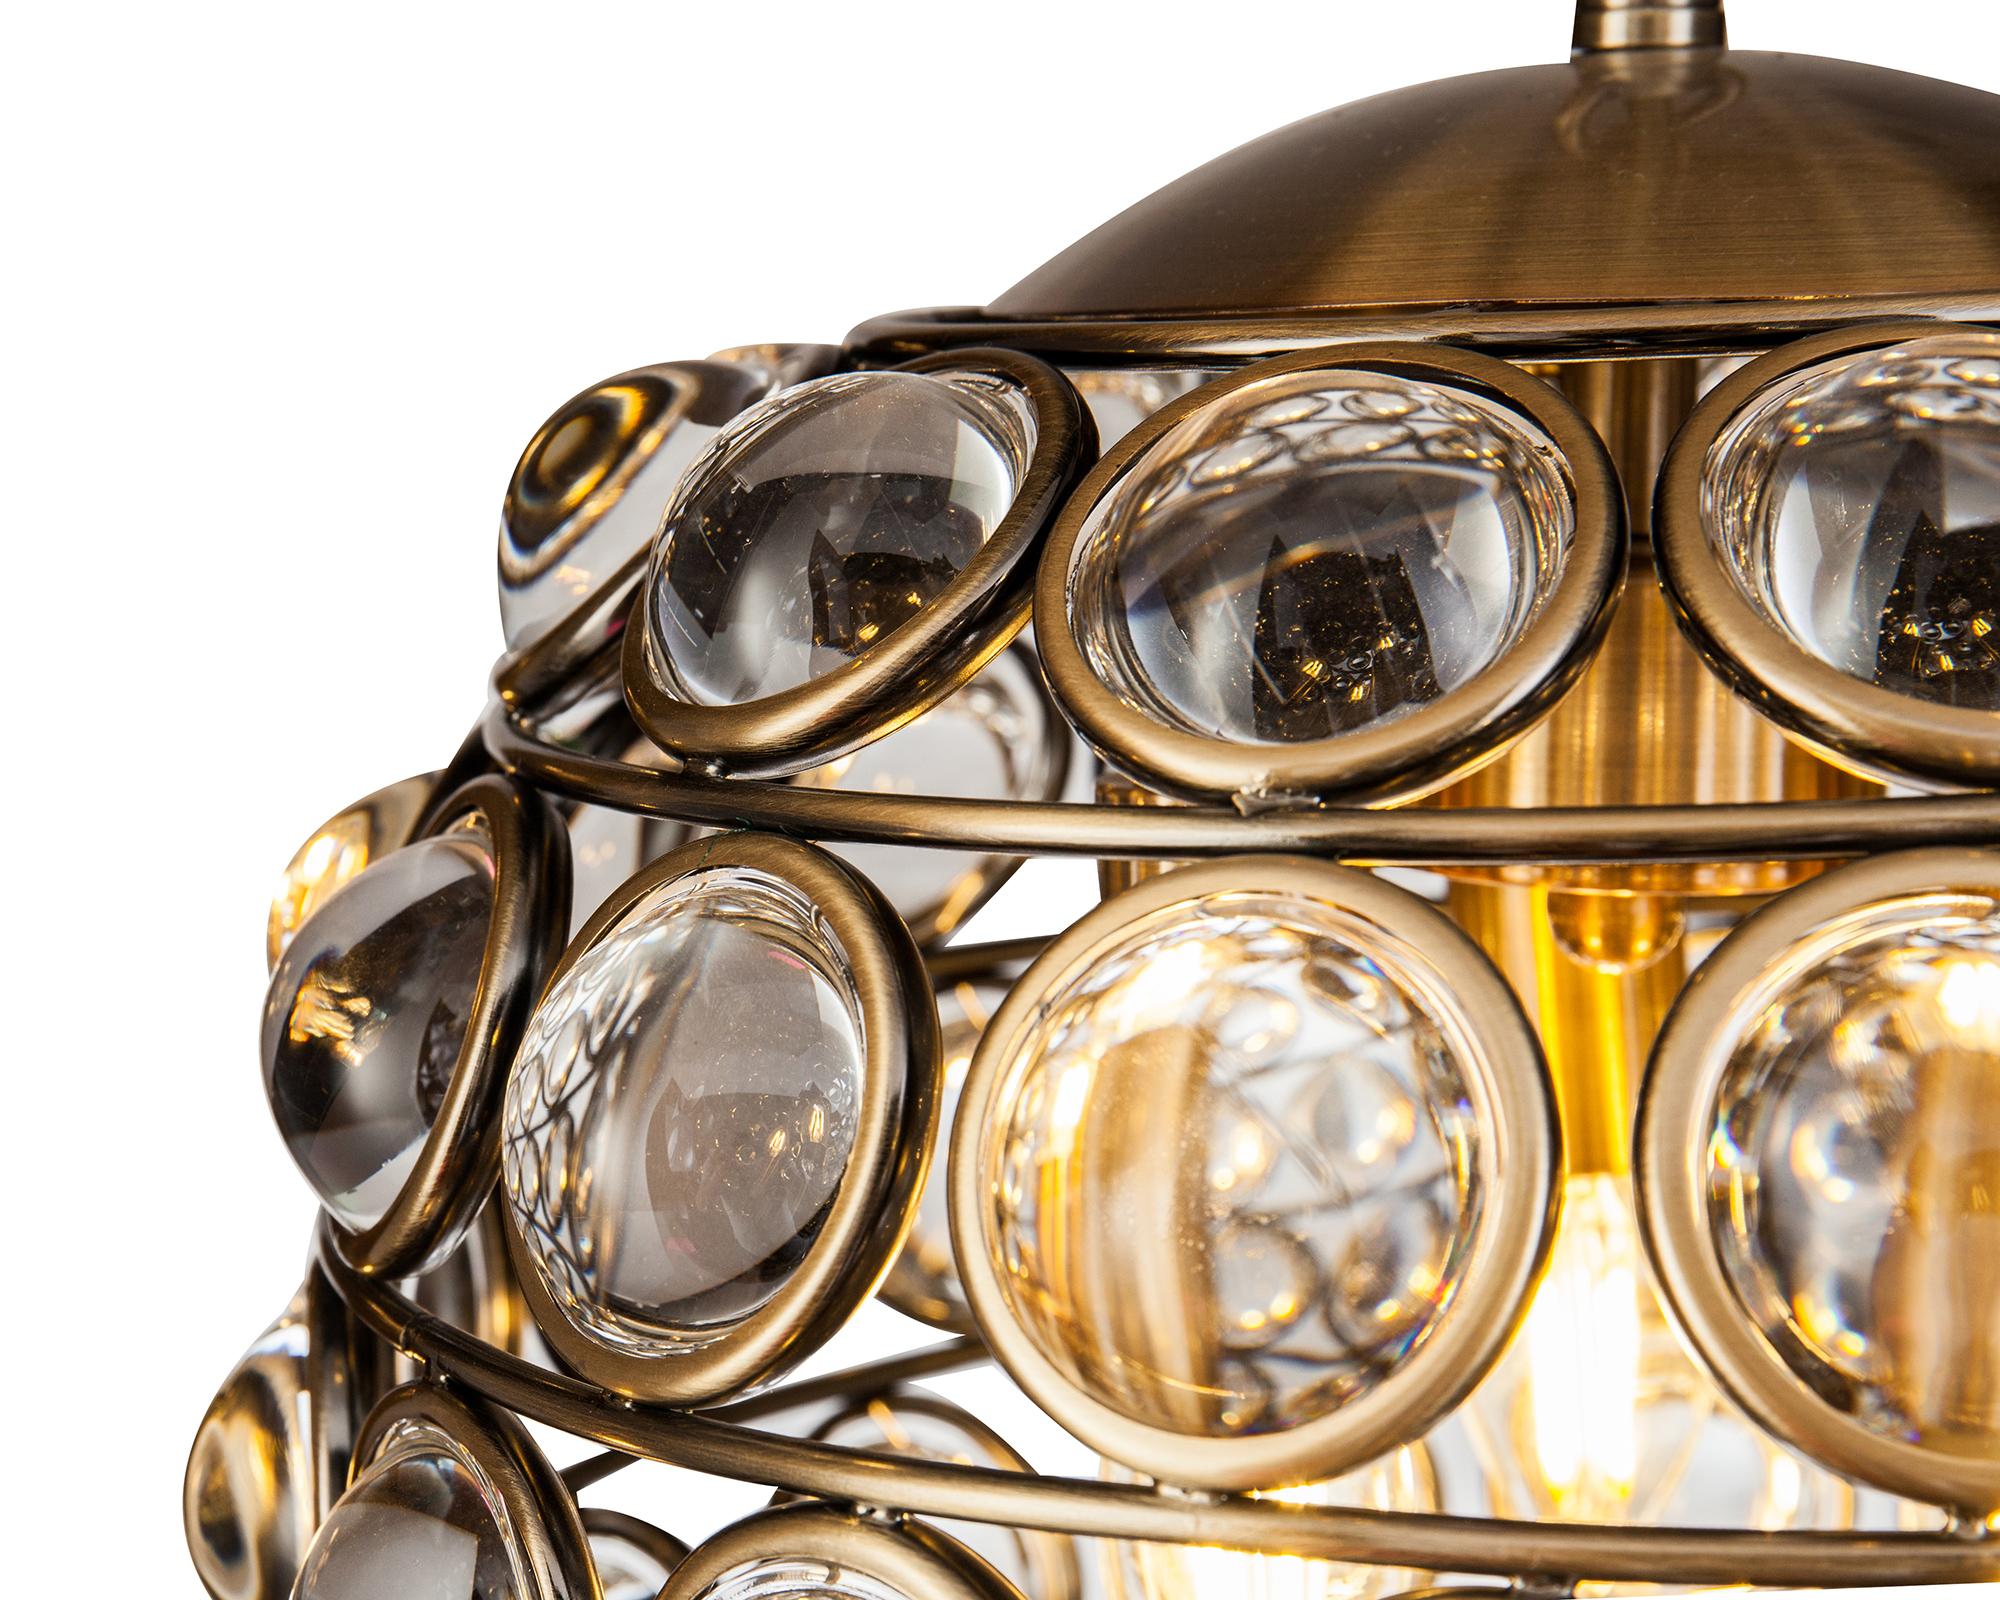 Liang & Eimil Colbert Pendant Lamp GD-LGT-0107 (2)